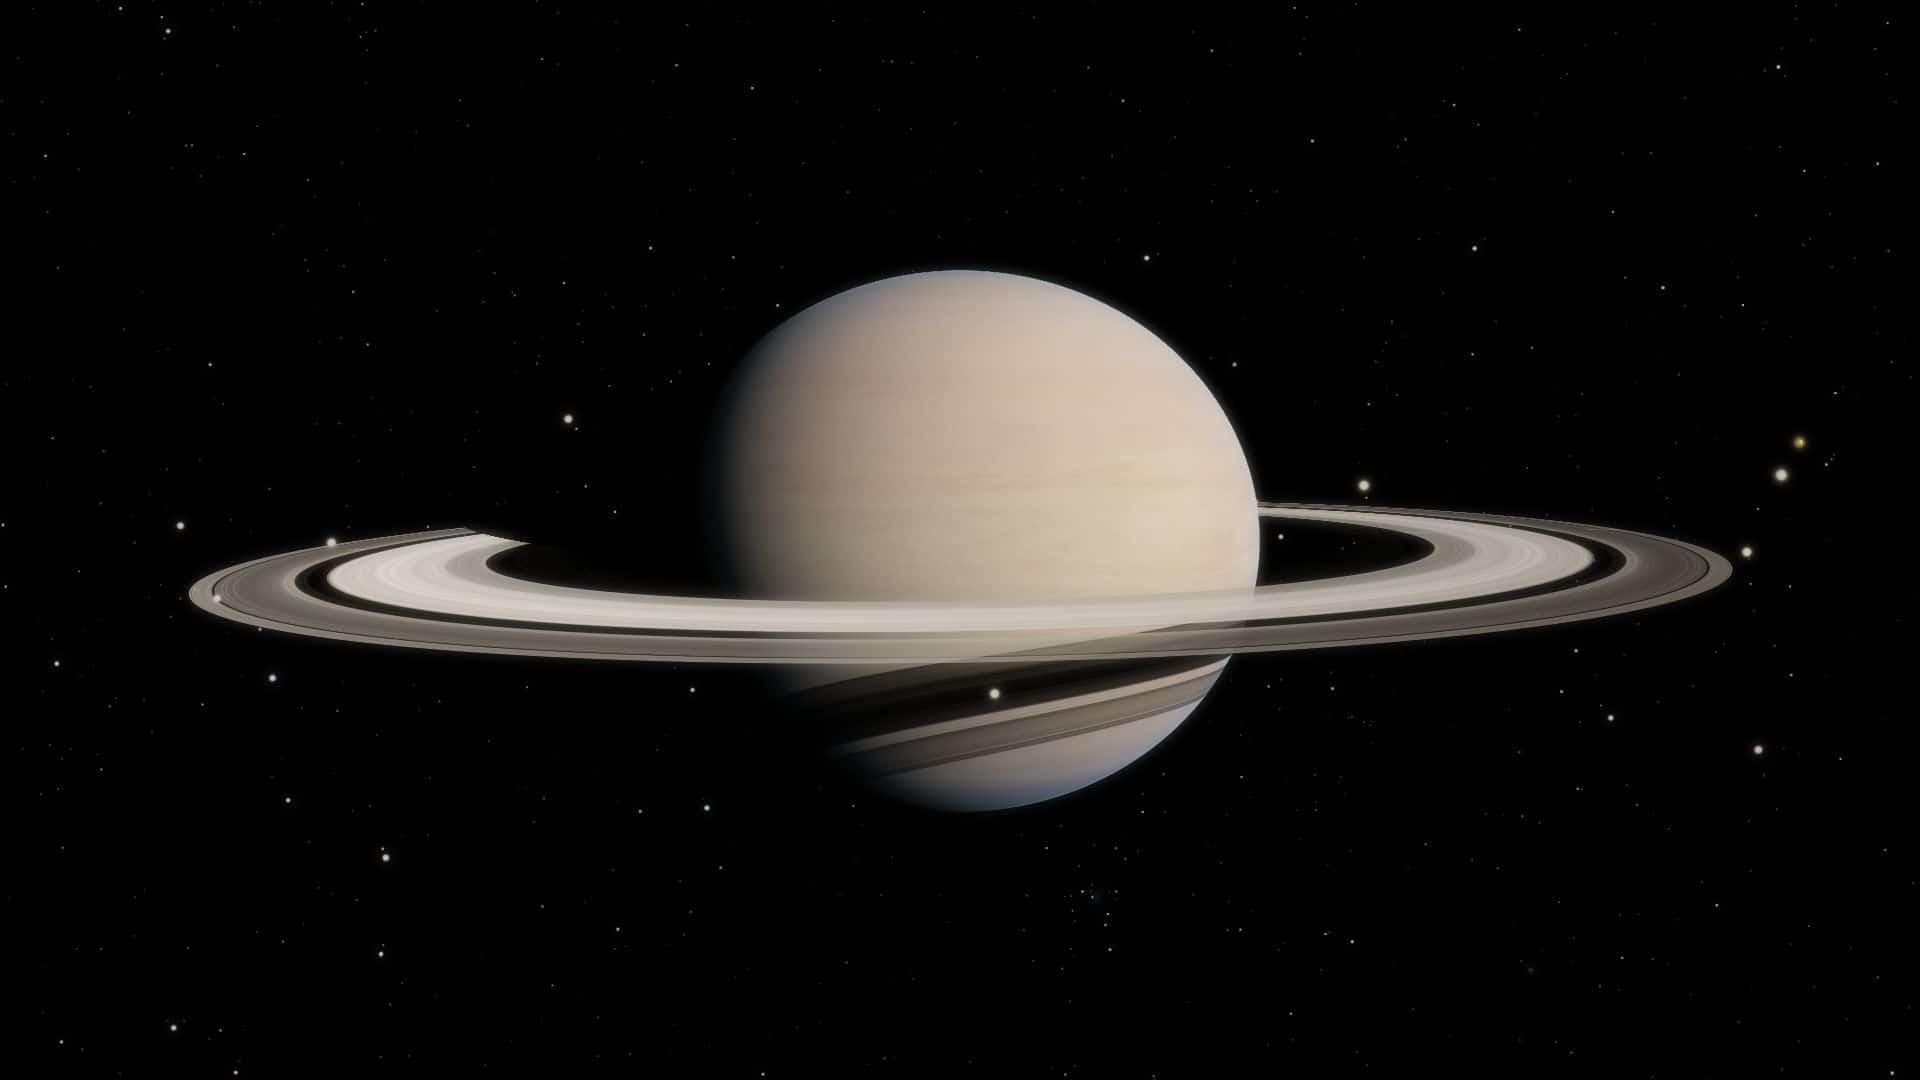 SpaceEngine-a-Free-Sandbox-Space-Exploration-Game